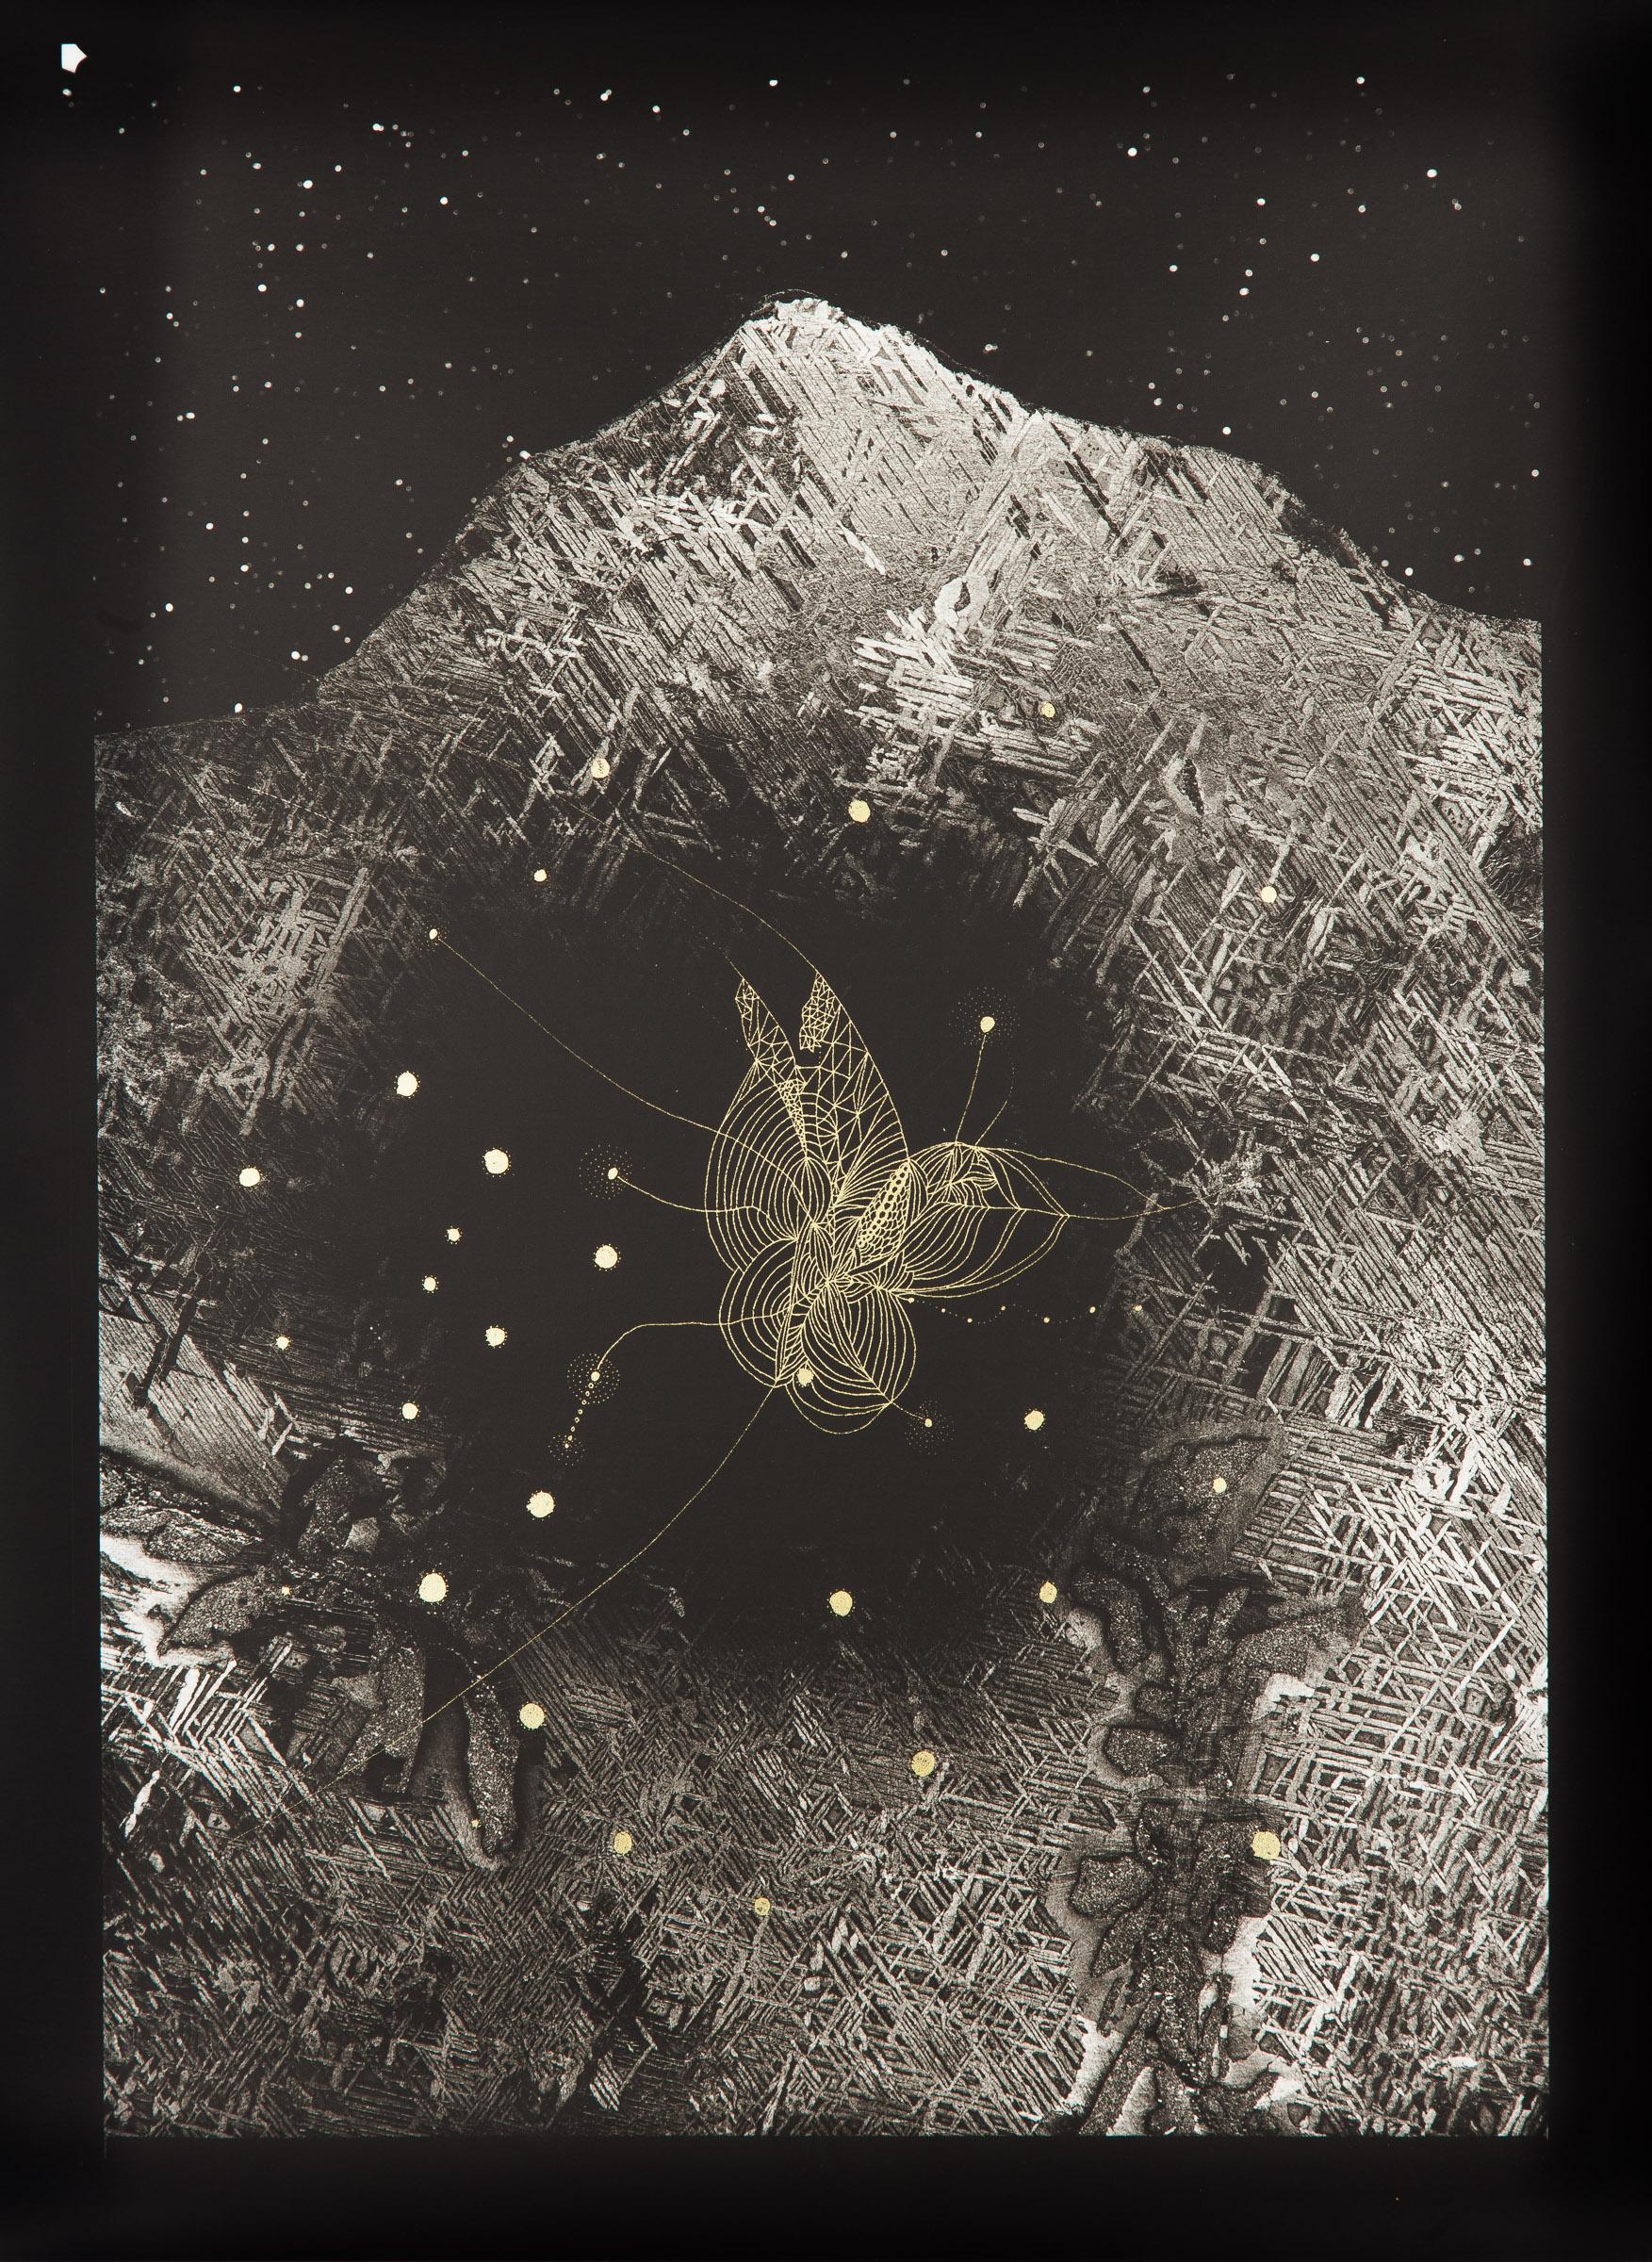 Collision - Meteorites-14.jpg